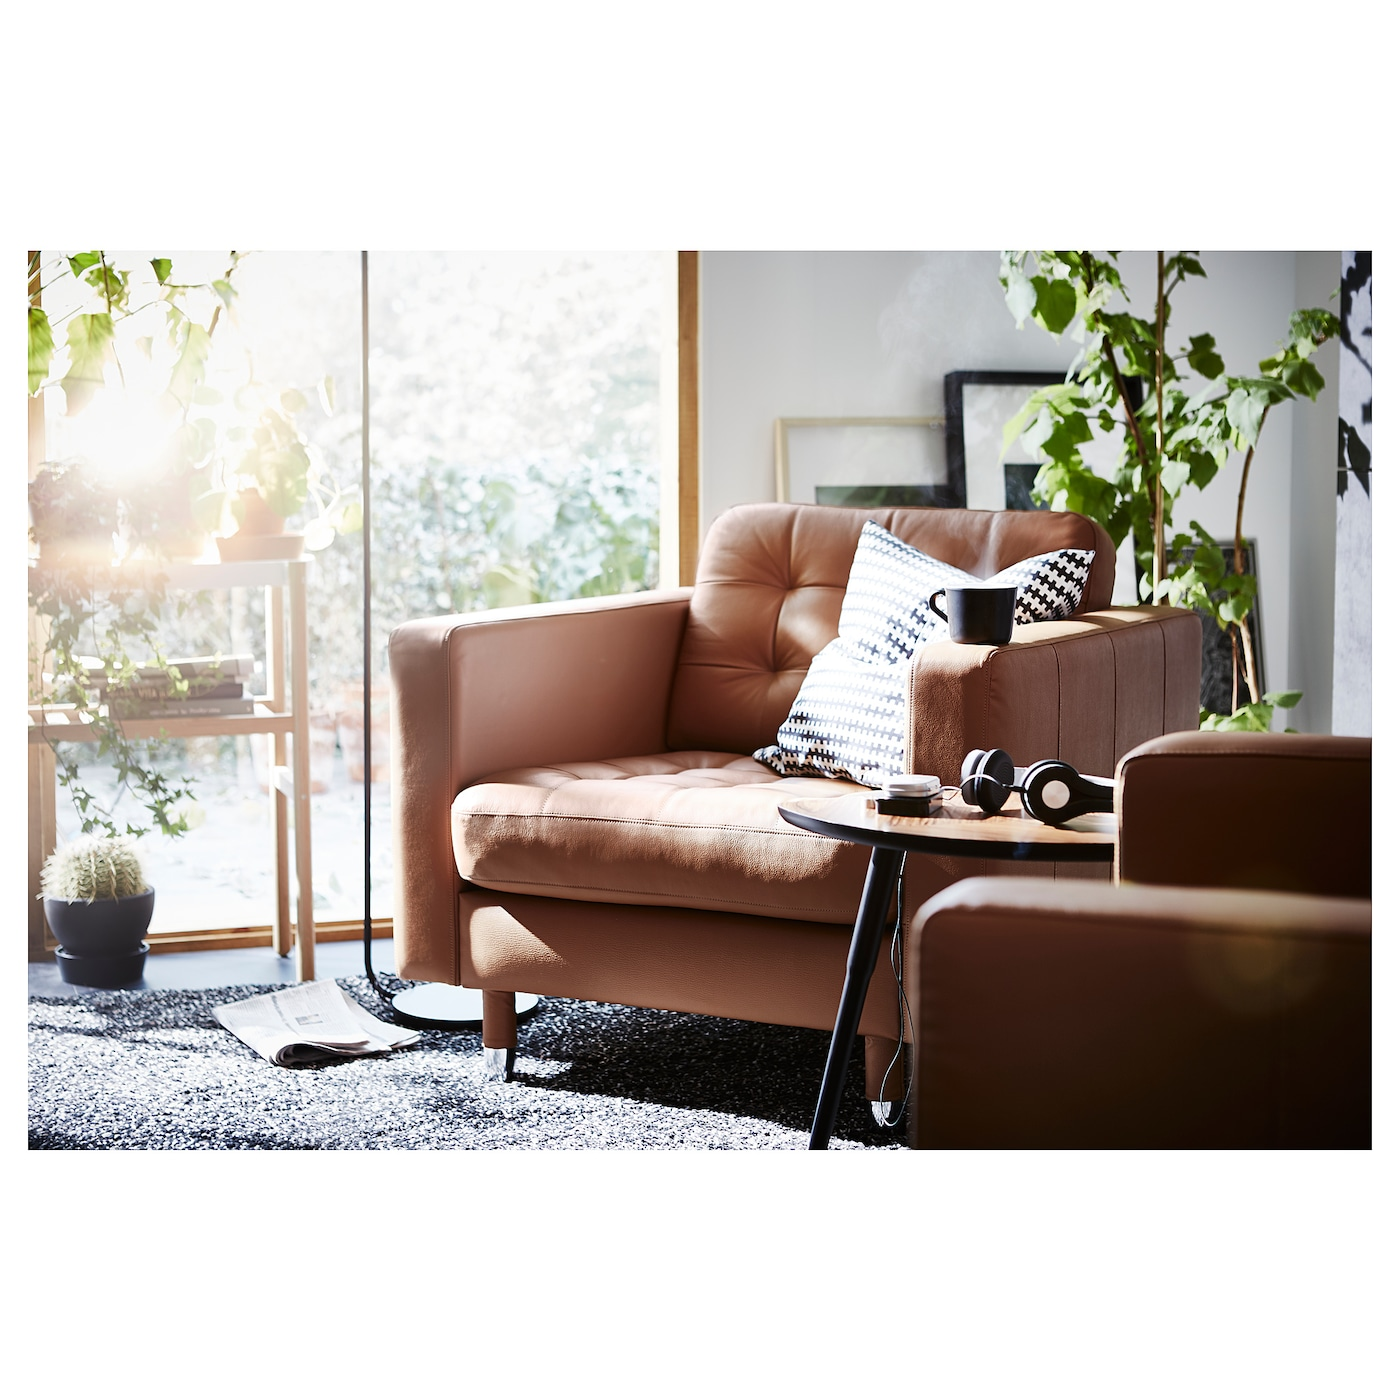 LANDSKRONA Lenestol GrannBomstad gyllenbruntre IKEA